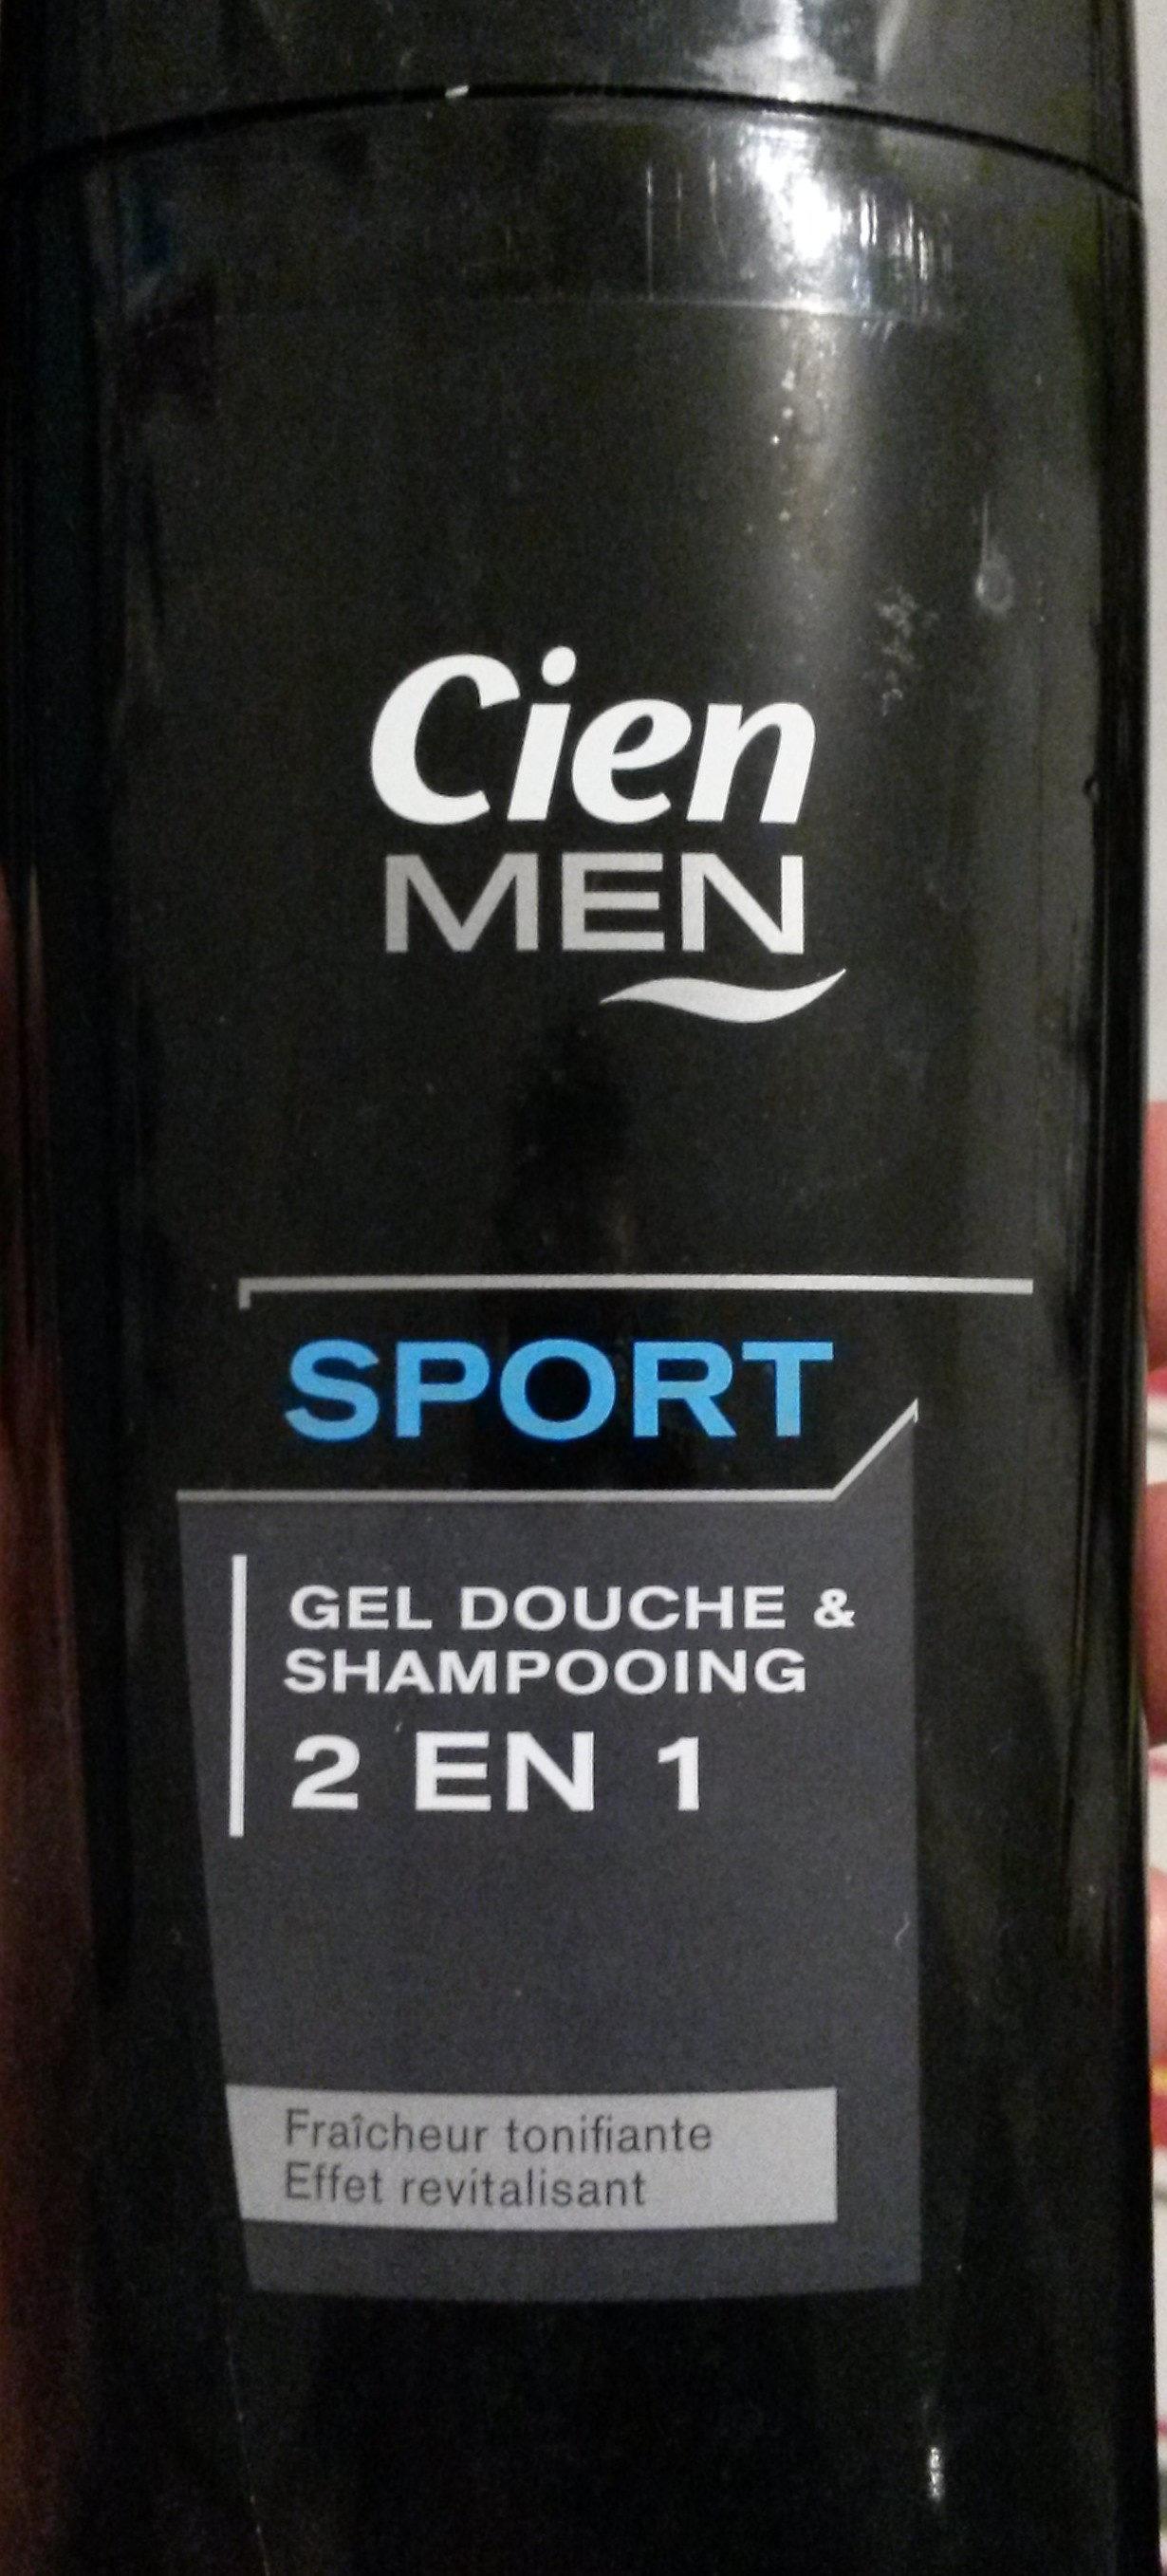 Gel douche et shampooing Sport 2 en 1 - Produit - fr